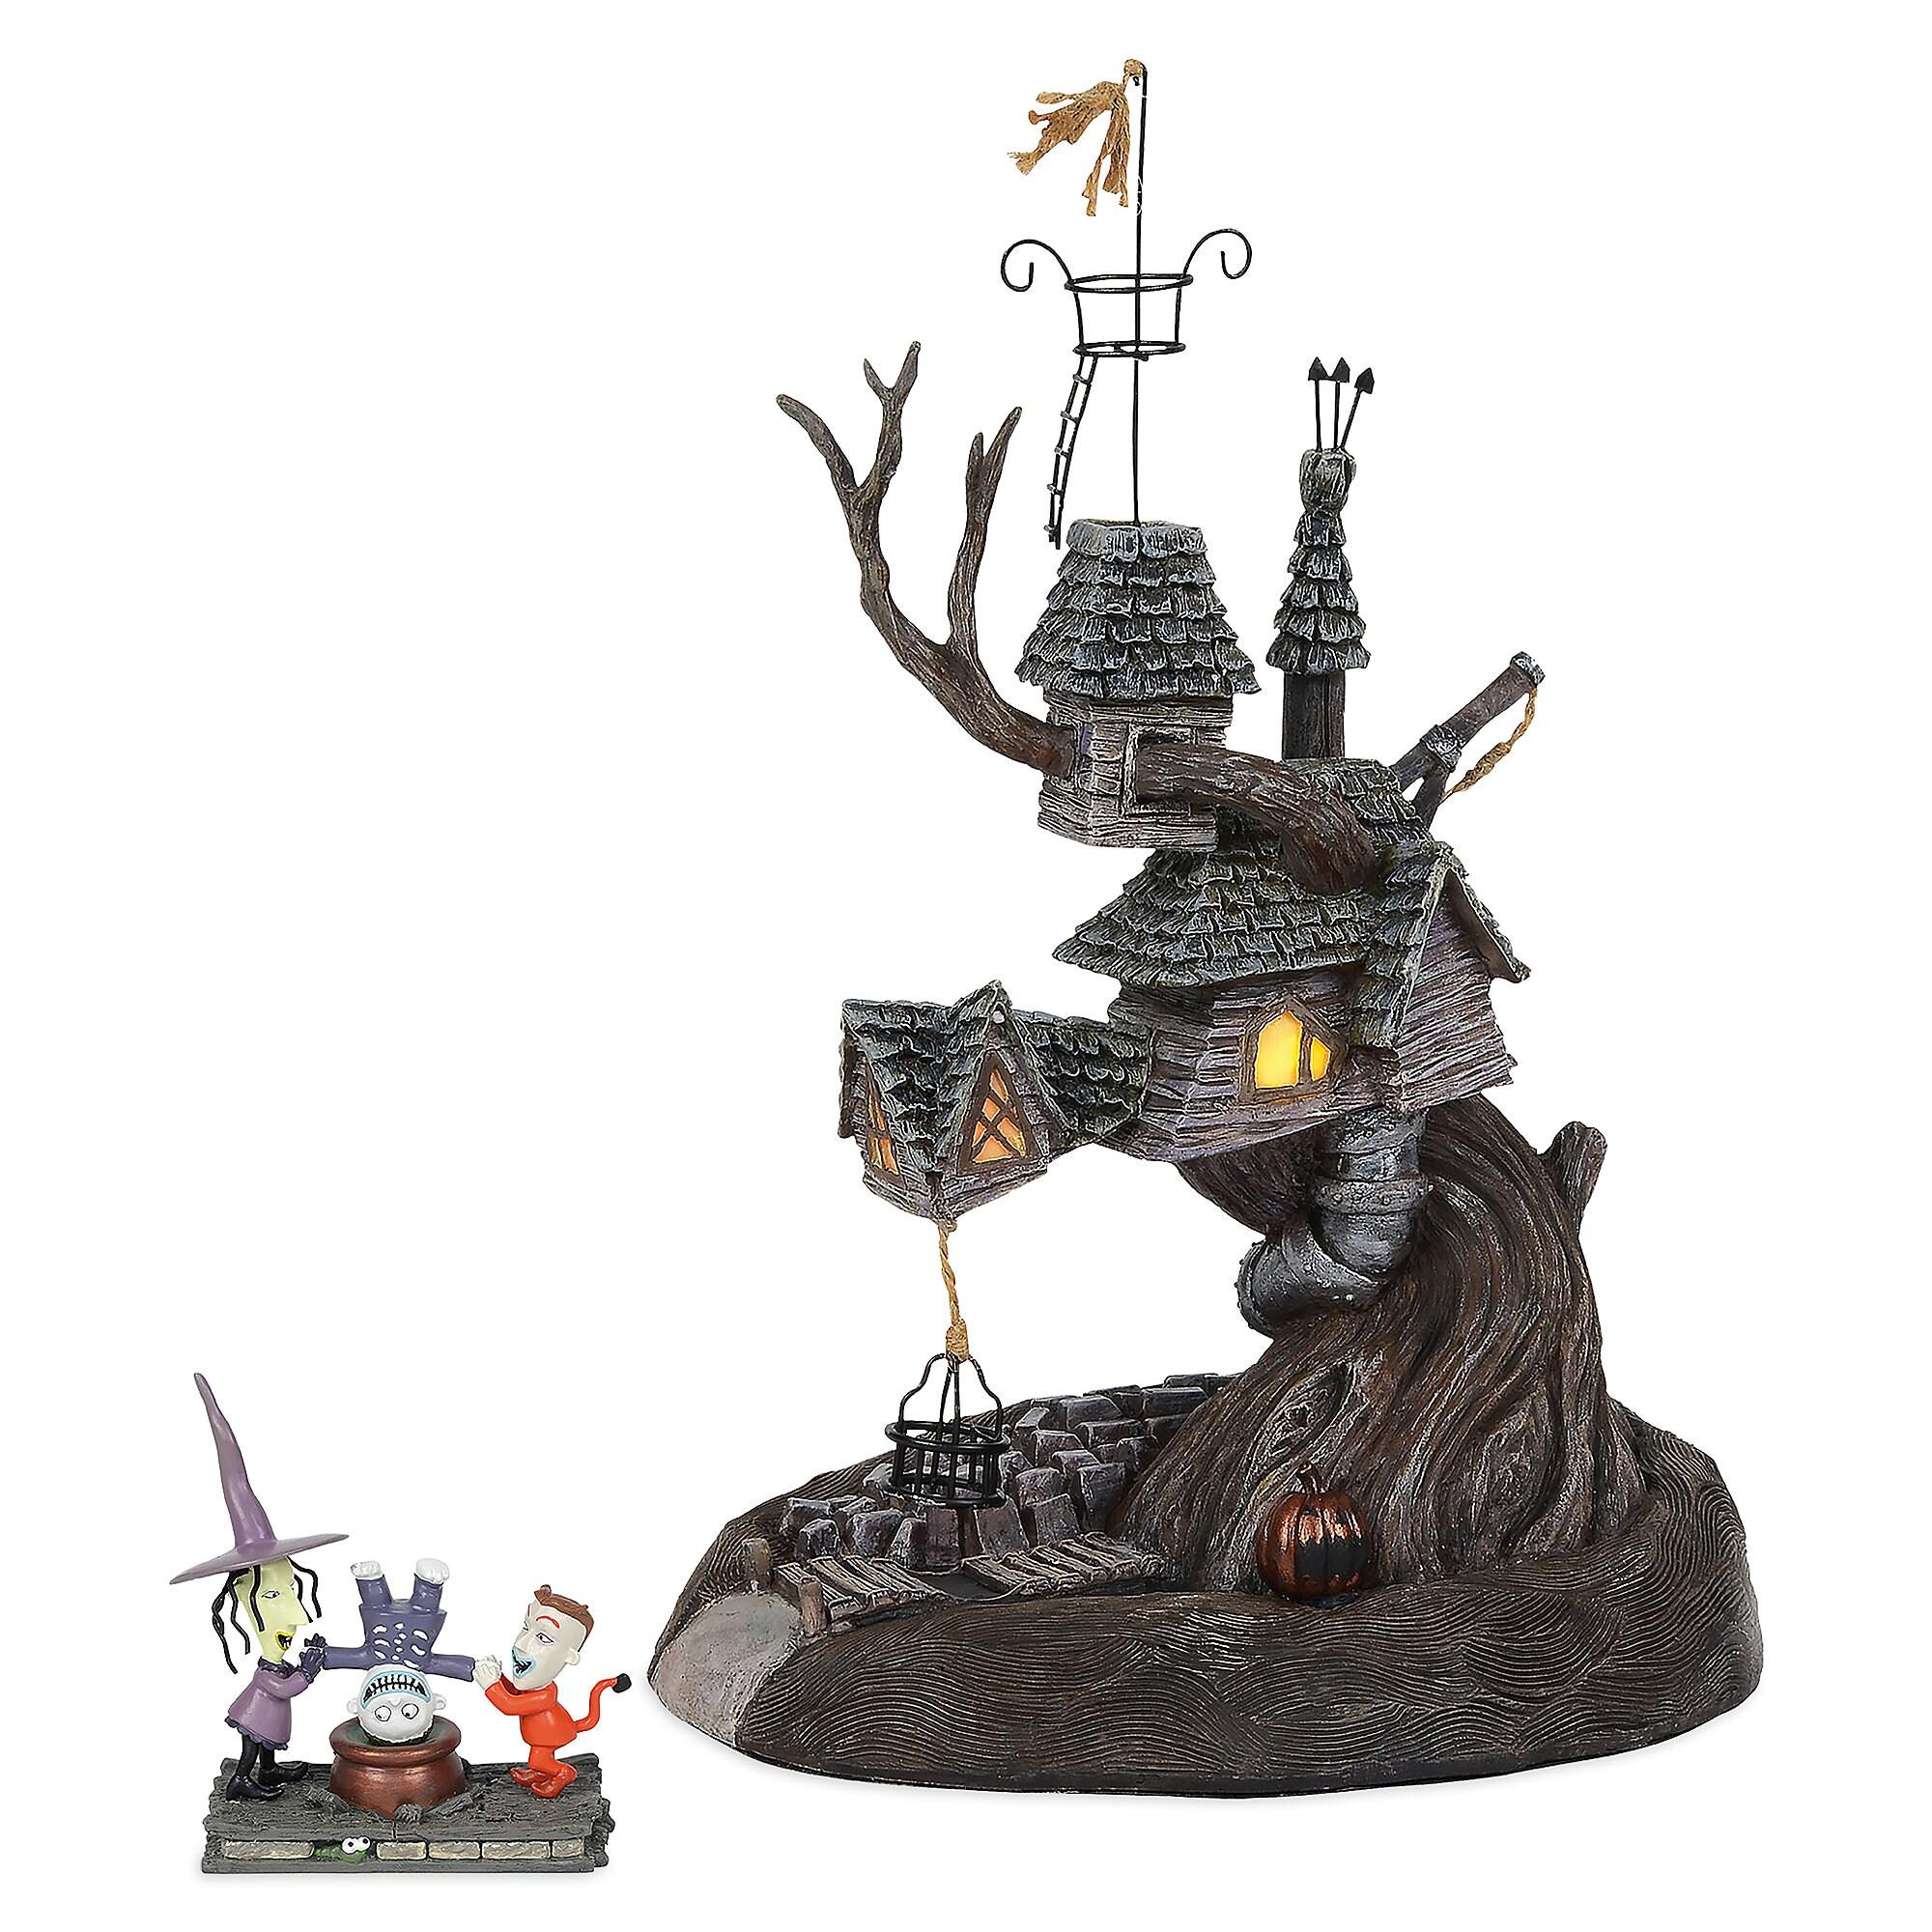 Lock, Shock & Barrel Treehouse Figurine by Dept. 56 - Nightmare Before Christmas